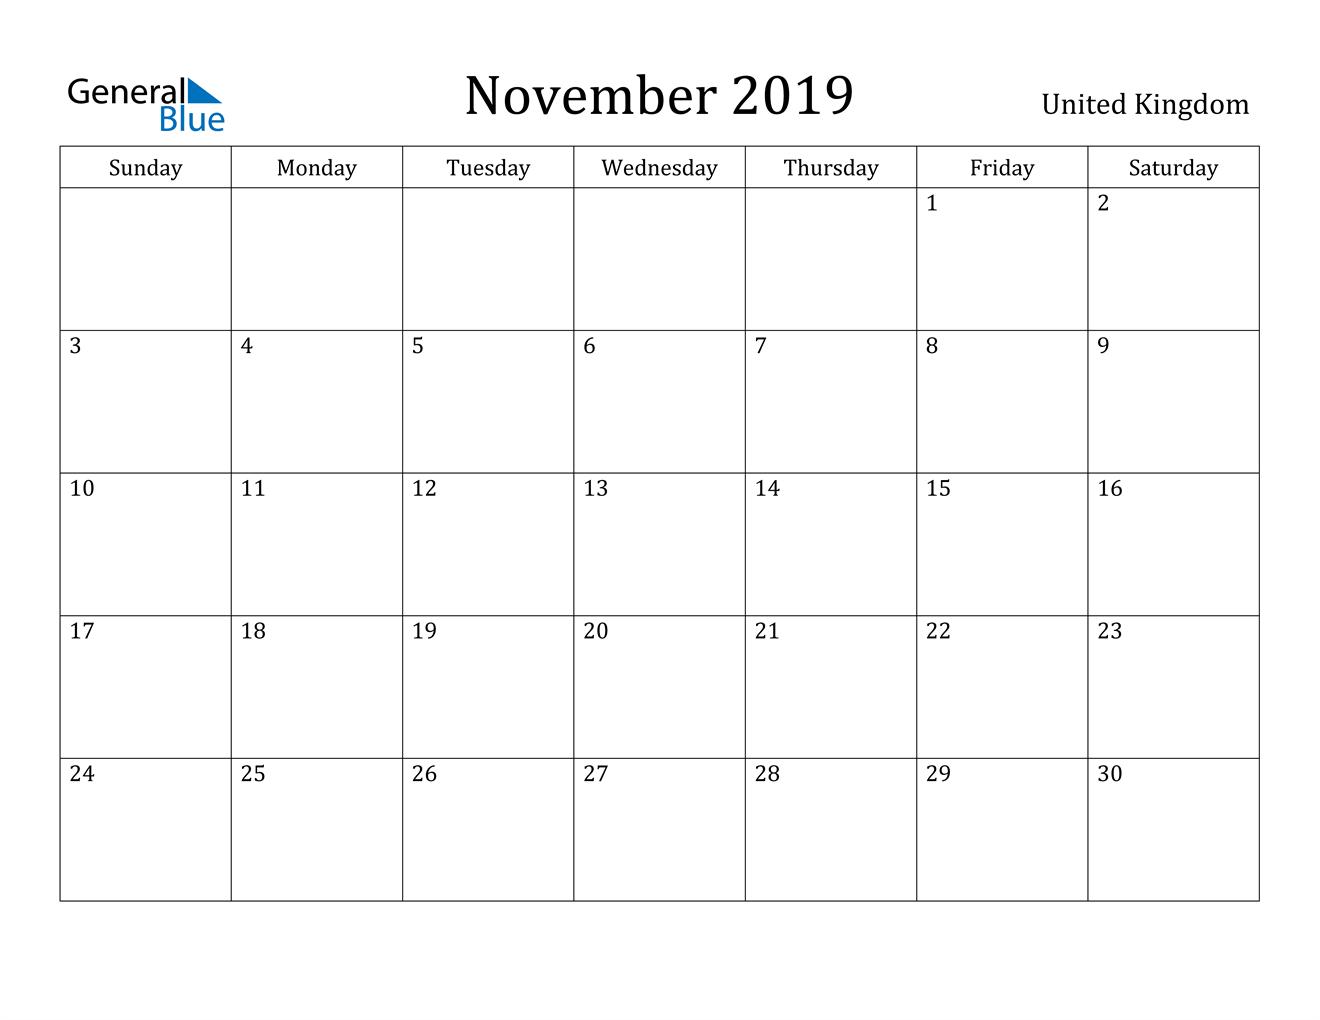 Image of November 2019 United Kingdom Calendar with Holidays Calendar